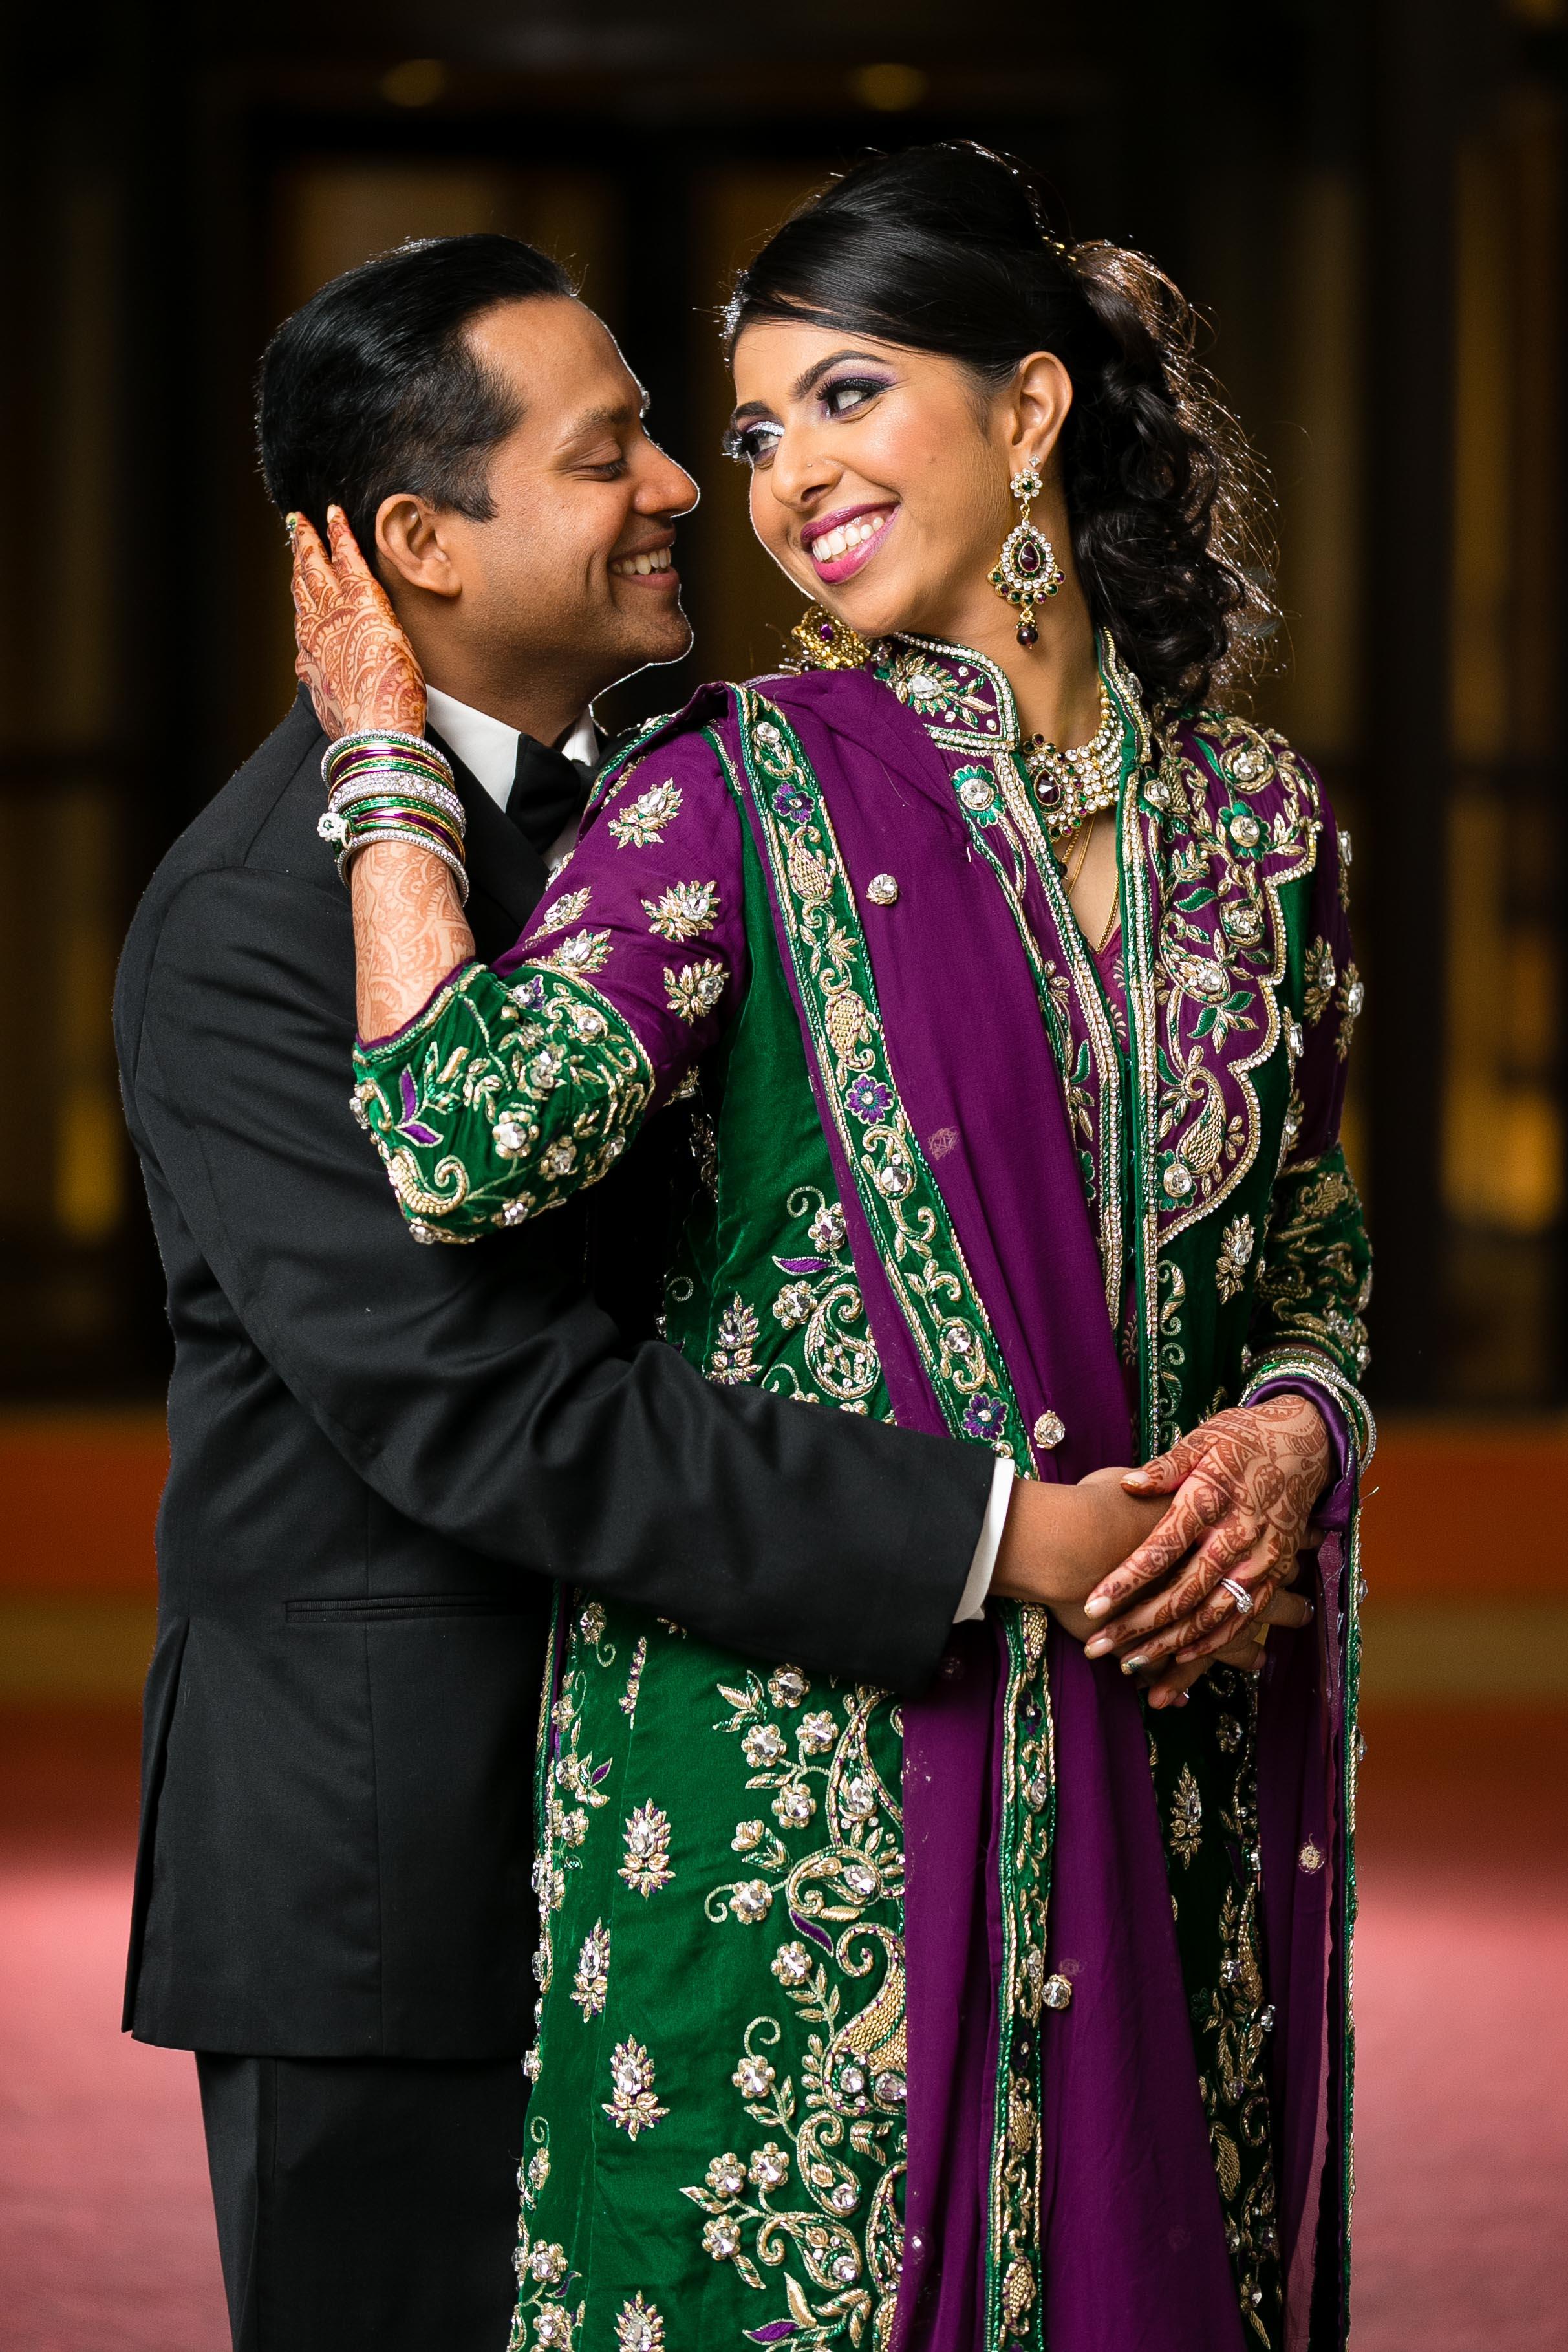 Luxurious-Indian-Wedding-Marriott-Boston-Massachusetts-Documentary-Wedding-Photography-by-Jacek-Dolata-33.jpg